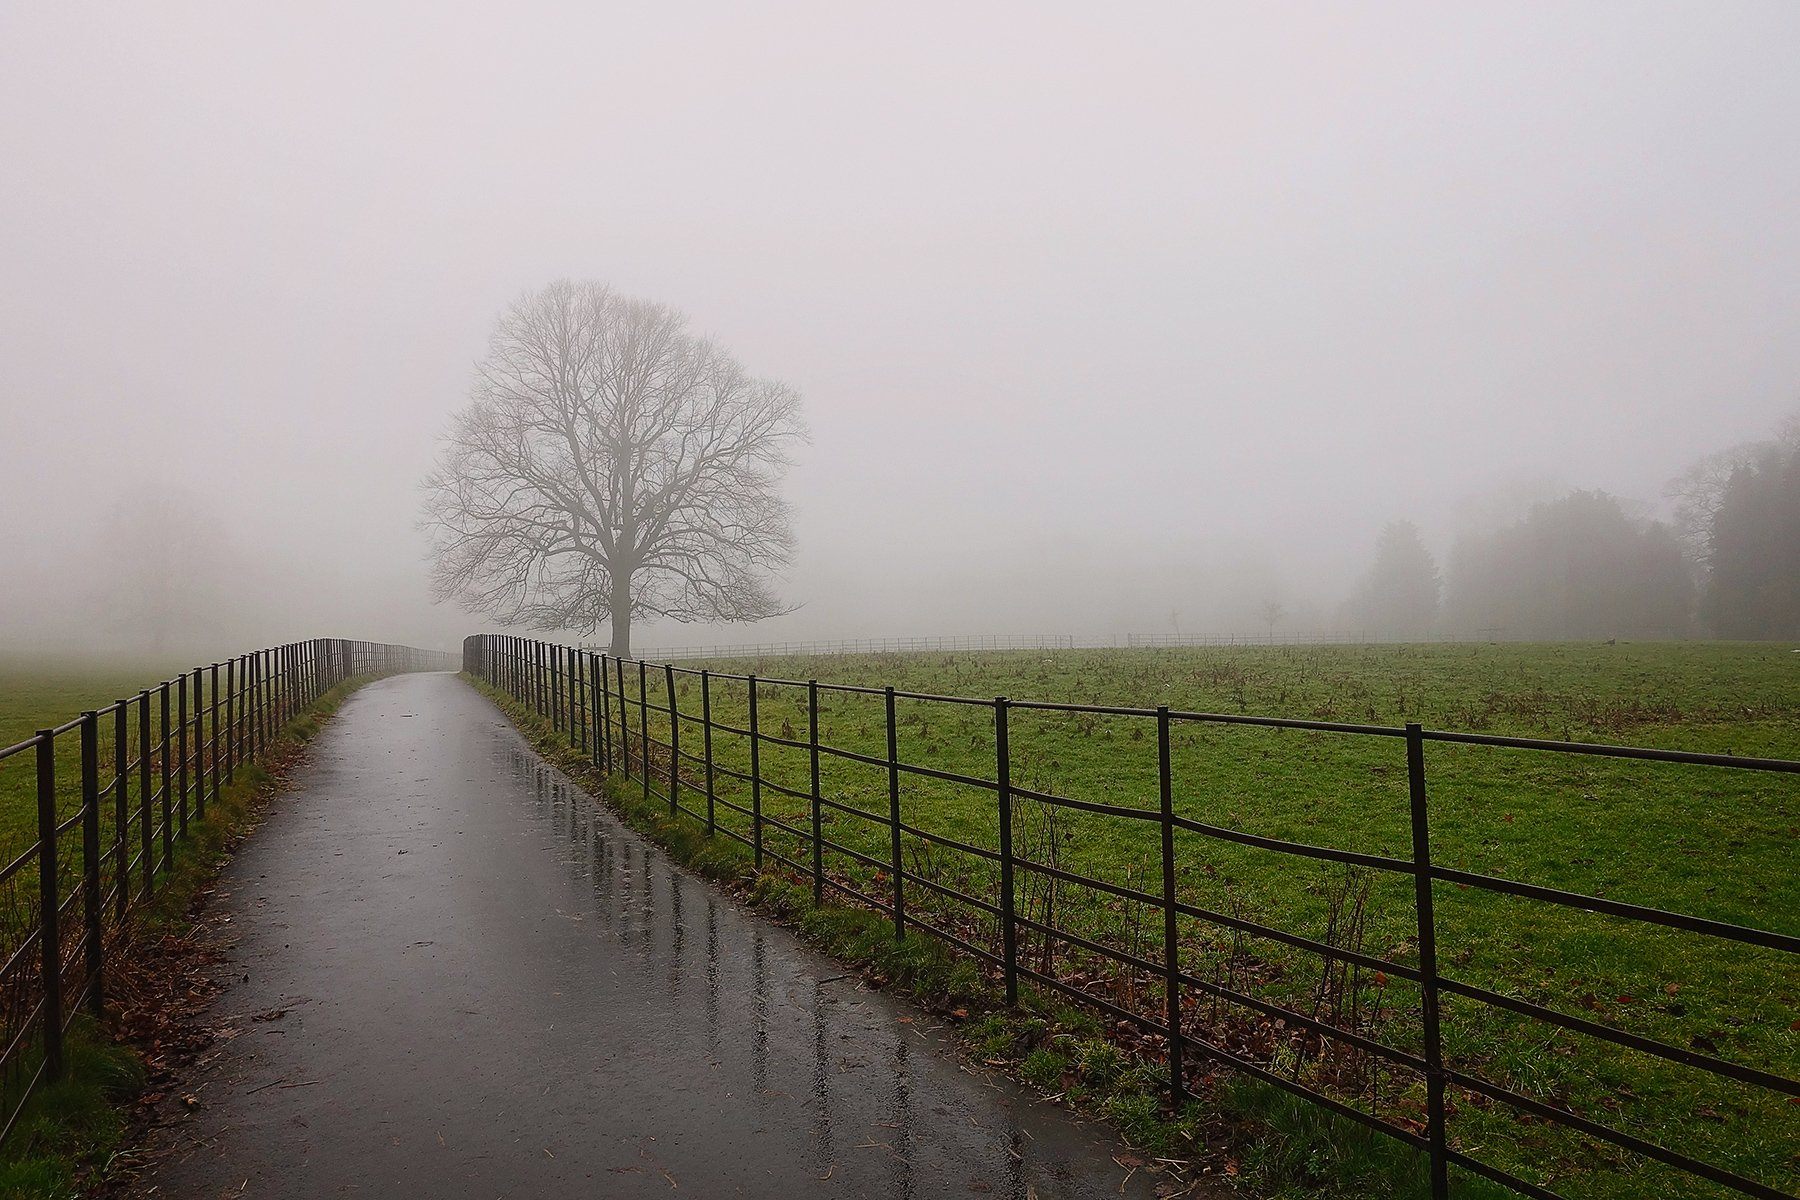 Misty Graves park in Sheffield